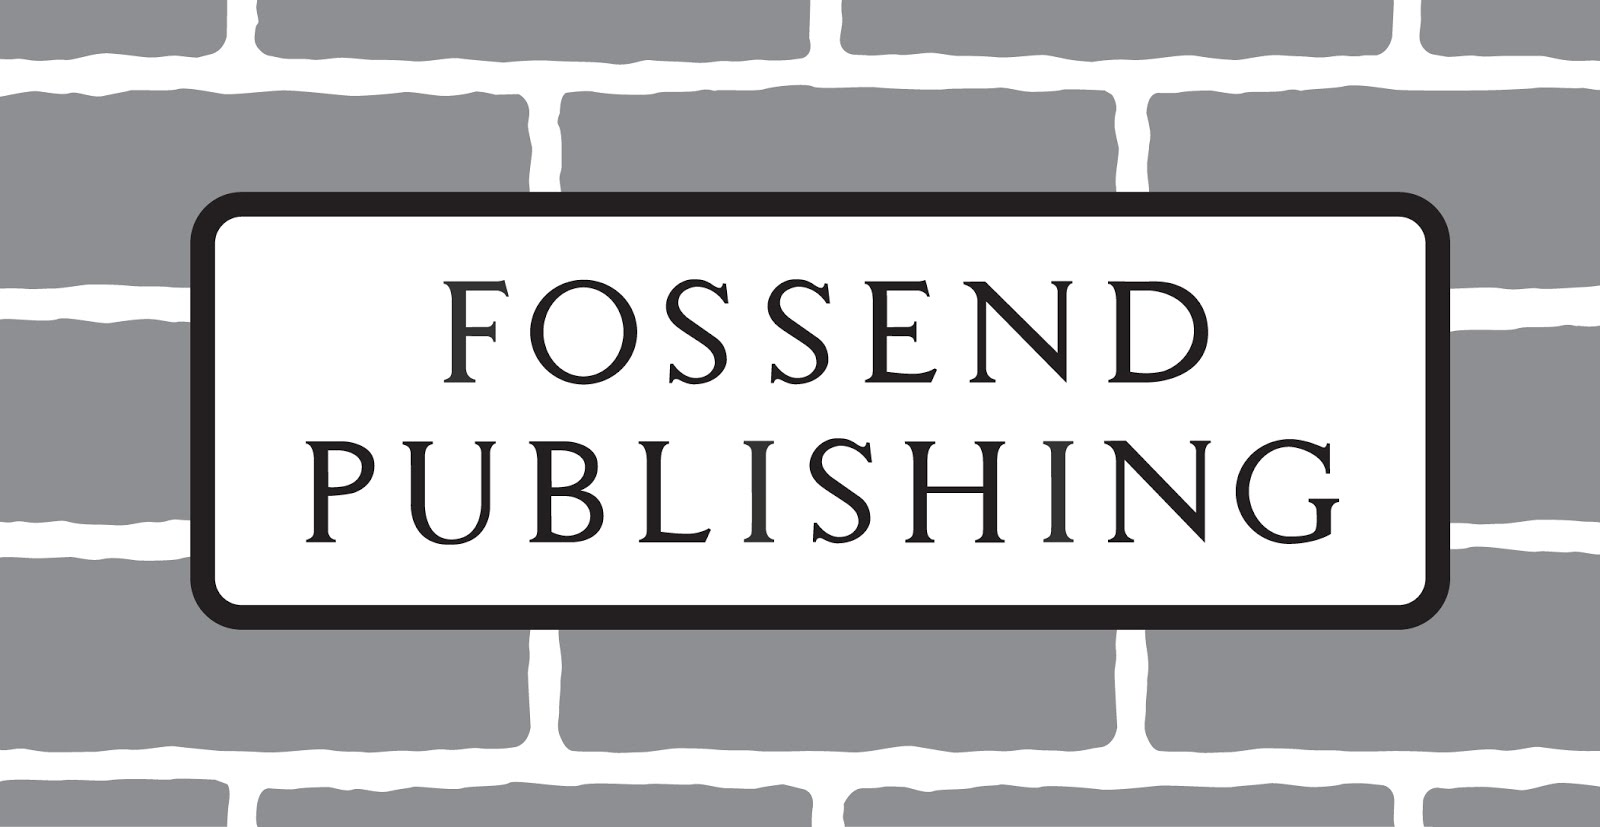 Fossend Publishing